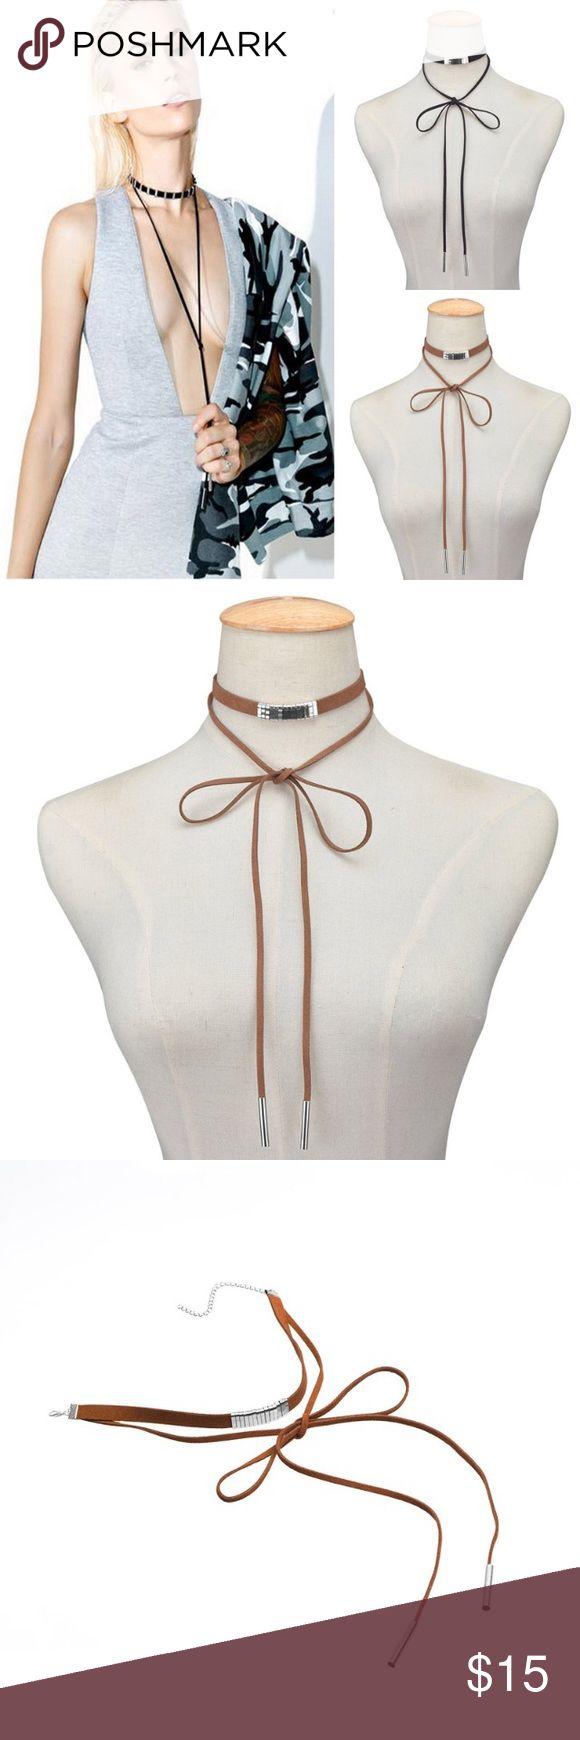 Bohemian Long Necklace Hot Newest ! Fashion bohemian long velvet necklace. Brown color! Jewelry Necklaces